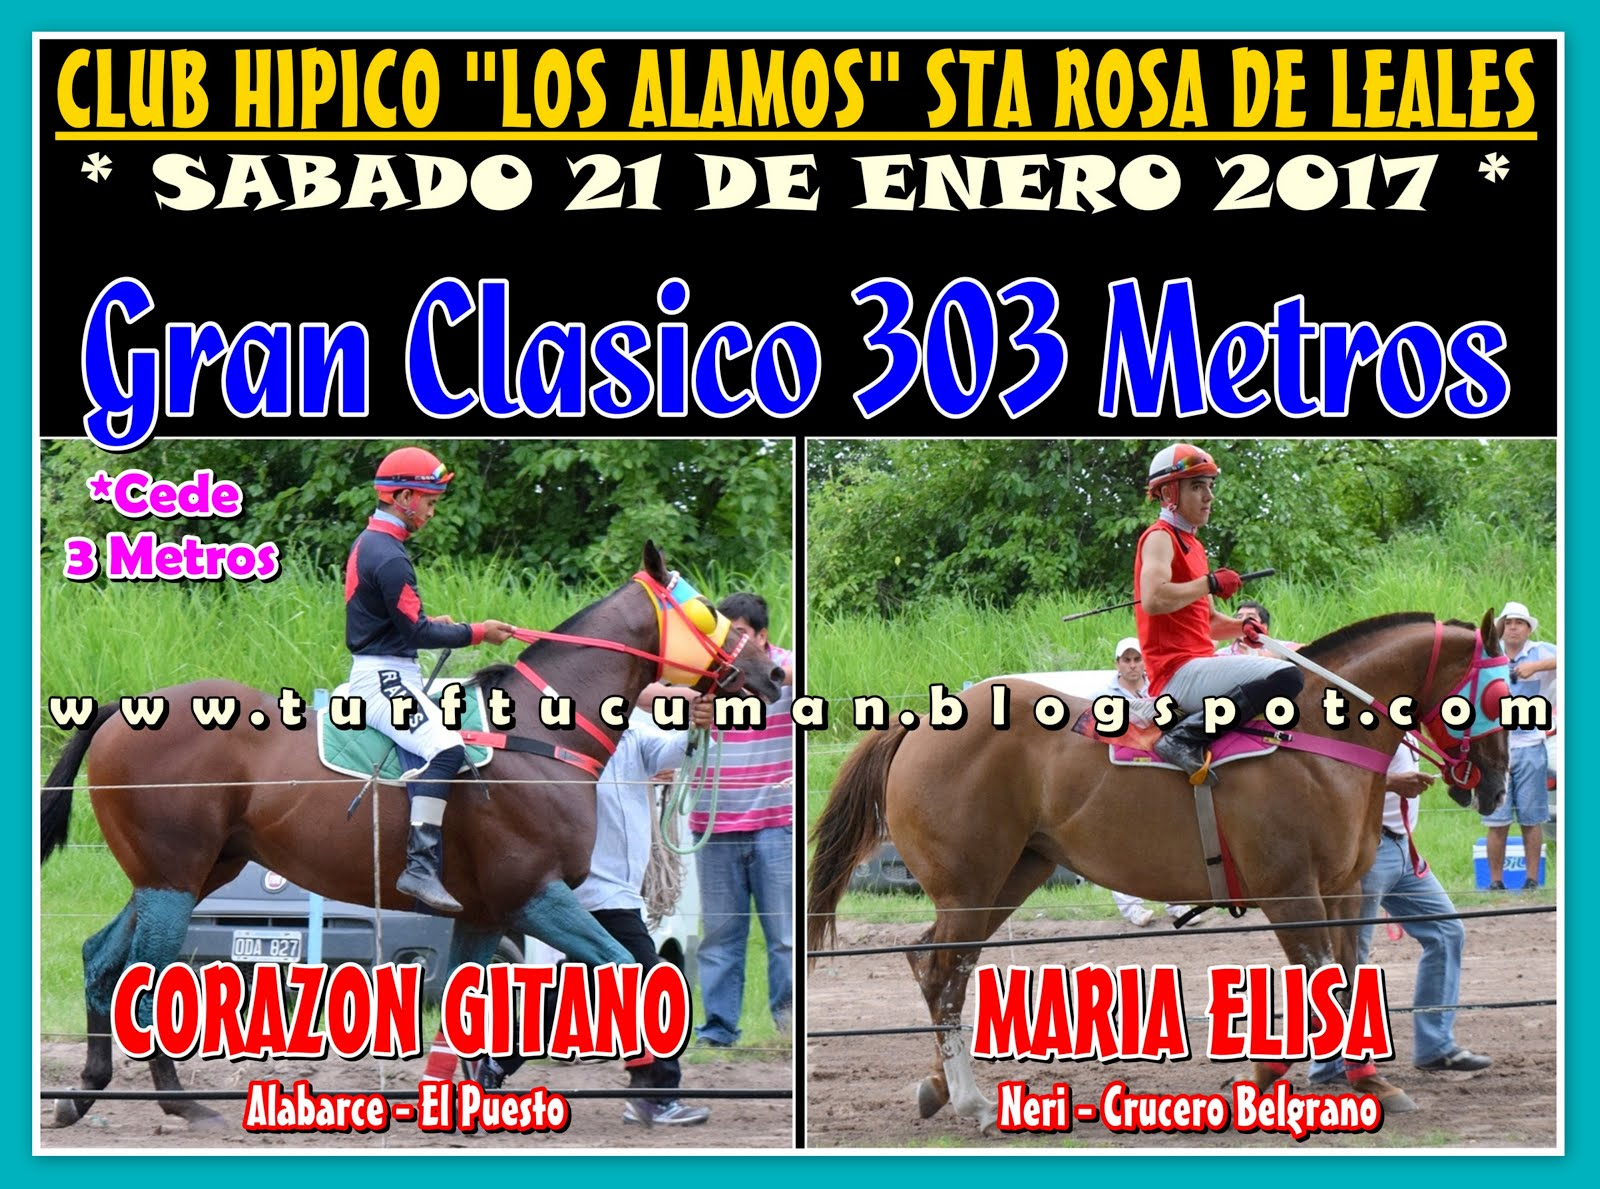 CORAZON GITANO VS MARIA ELISA